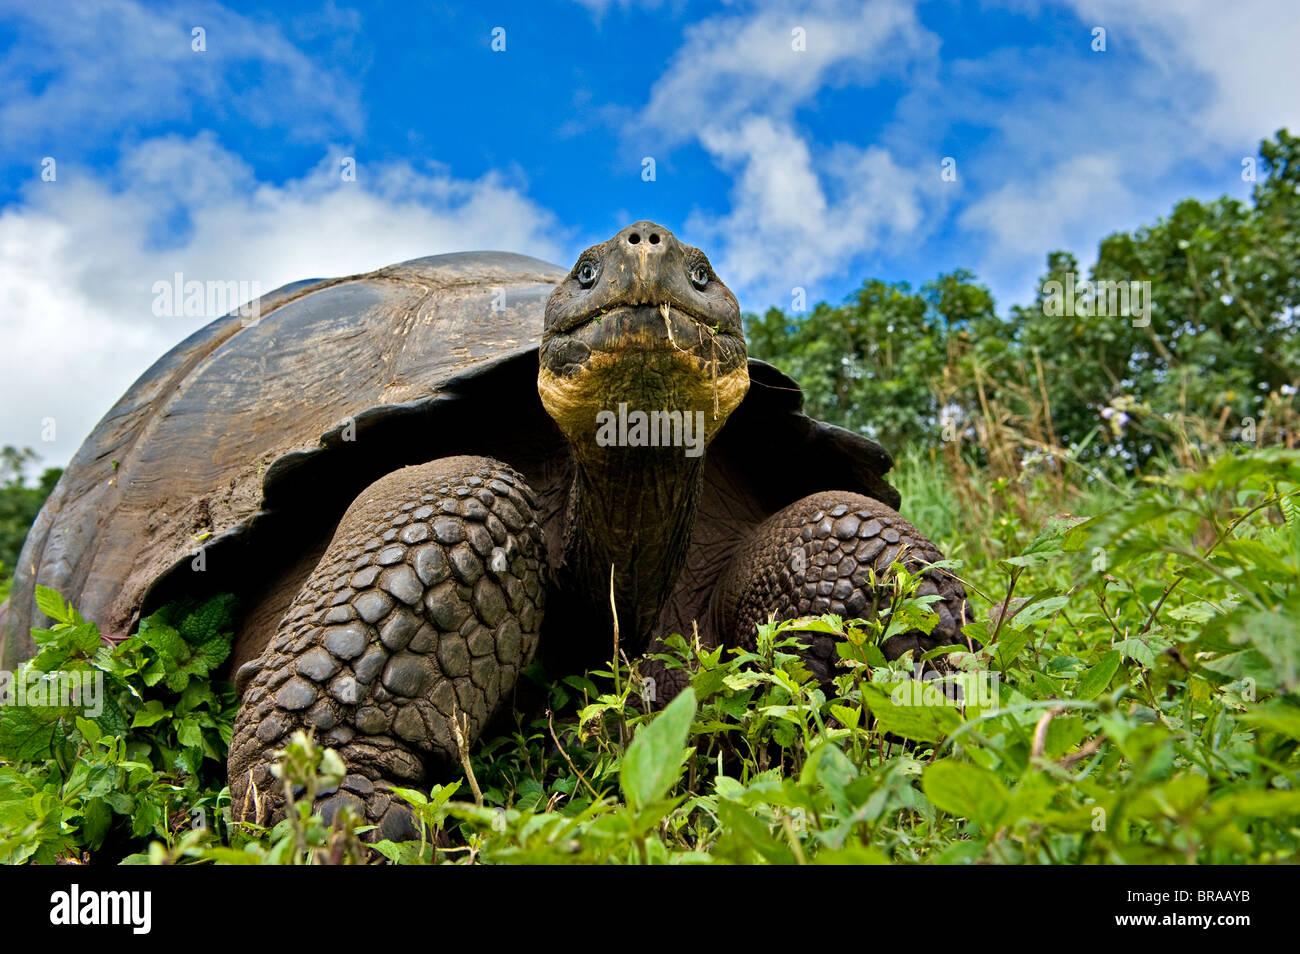 Tortue géante des Galapagos (Geochelone elephantopus / nigra) alimentation adultes, Santa Cruz, Galapagos Photo Stock